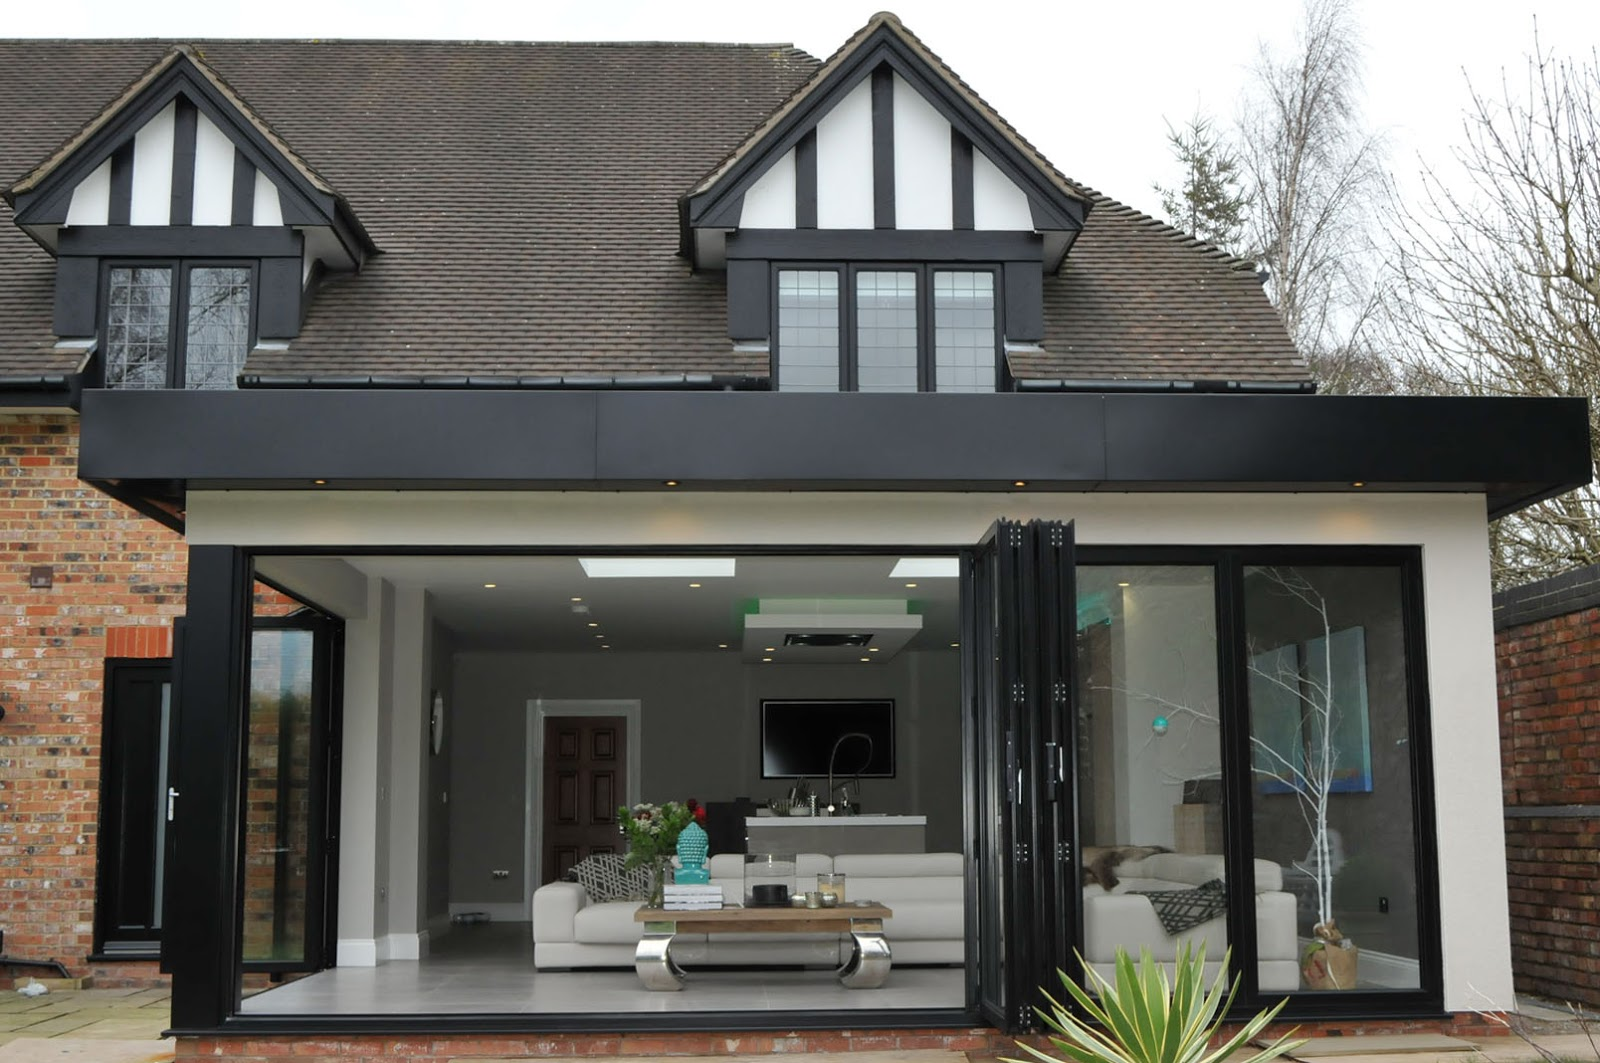 urban building projects. Black Bedroom Furniture Sets. Home Design Ideas